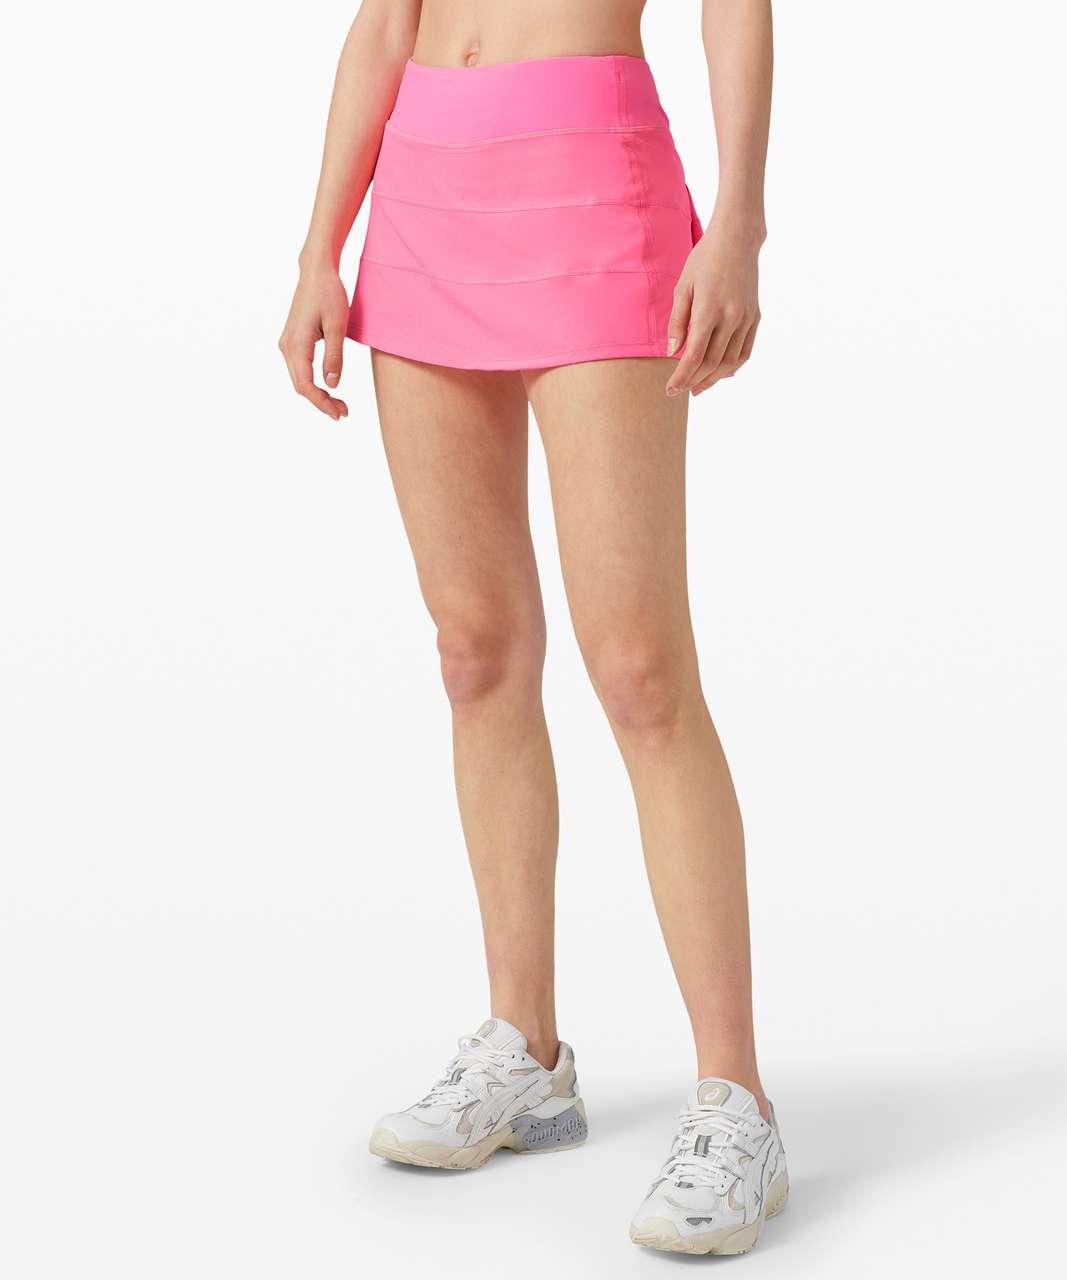 "Lululemon Pace Rival Skirt (Regular) *4-way Stretch 13"" - Dark Prism Pink"